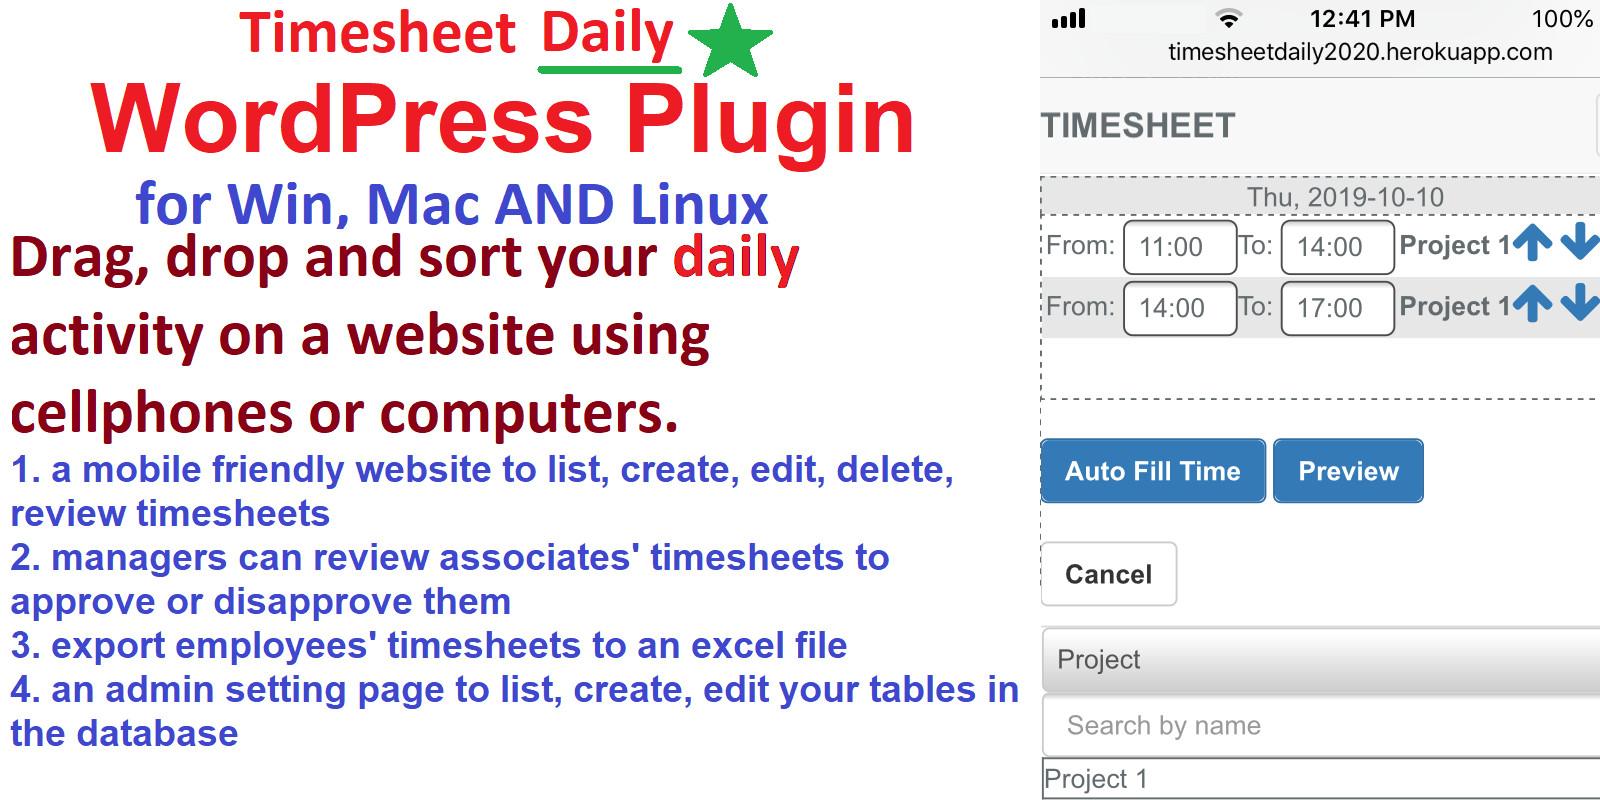 Daily Timesheet Management System WordPress Plugin